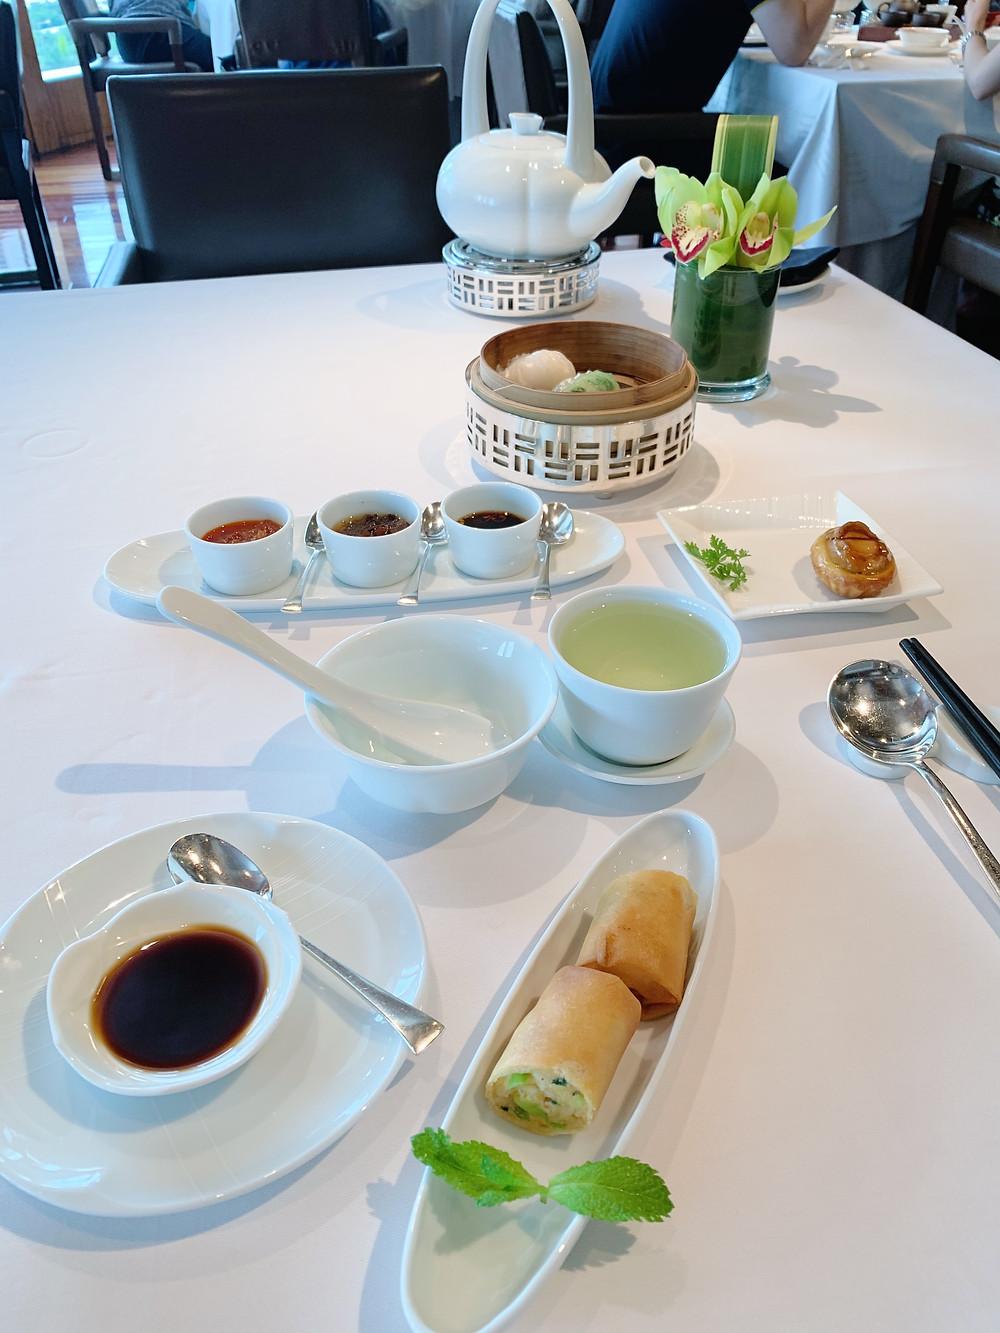 Lung King Heen Restaurant at the Four Seasons Hotel Hong Kong